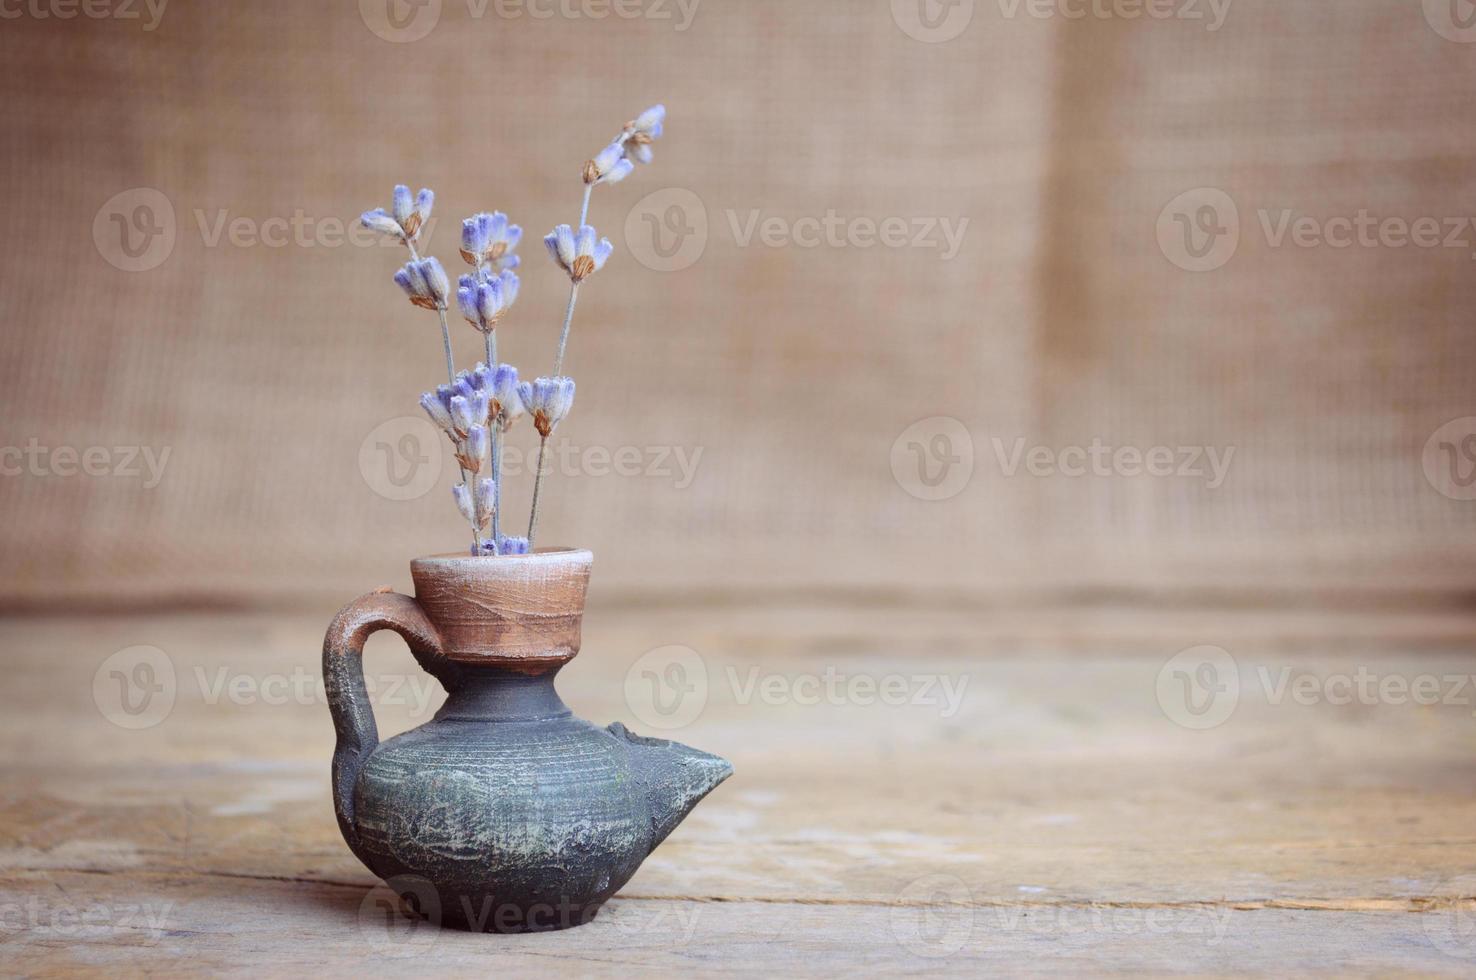 Lavender flower in bottle on wooden table photo